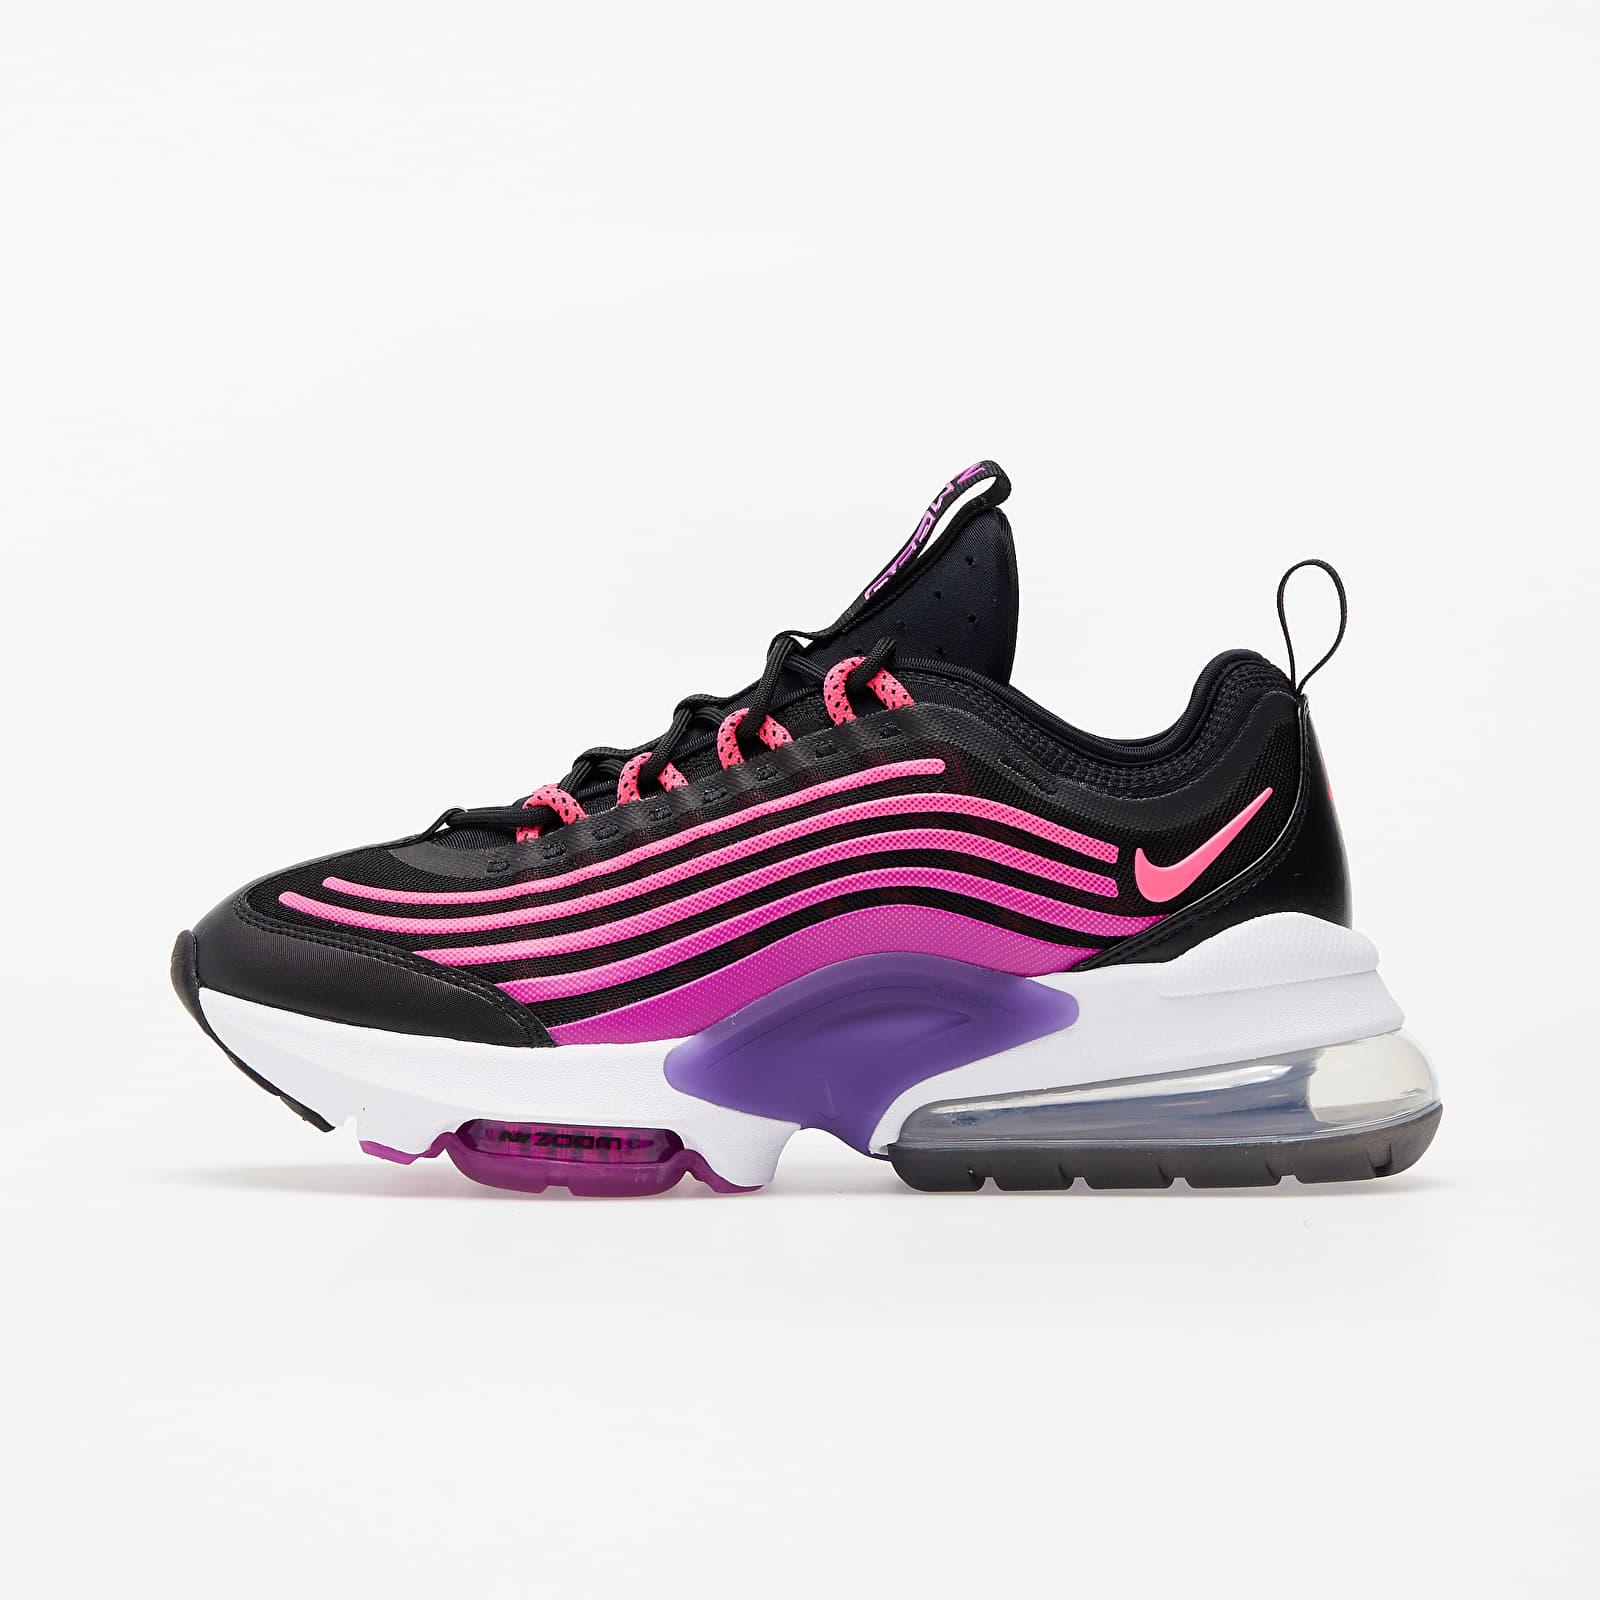 Dámske topánky a tenisky Nike W Air Max ZM950 Black/ Hyper Pink-Vivid Purple